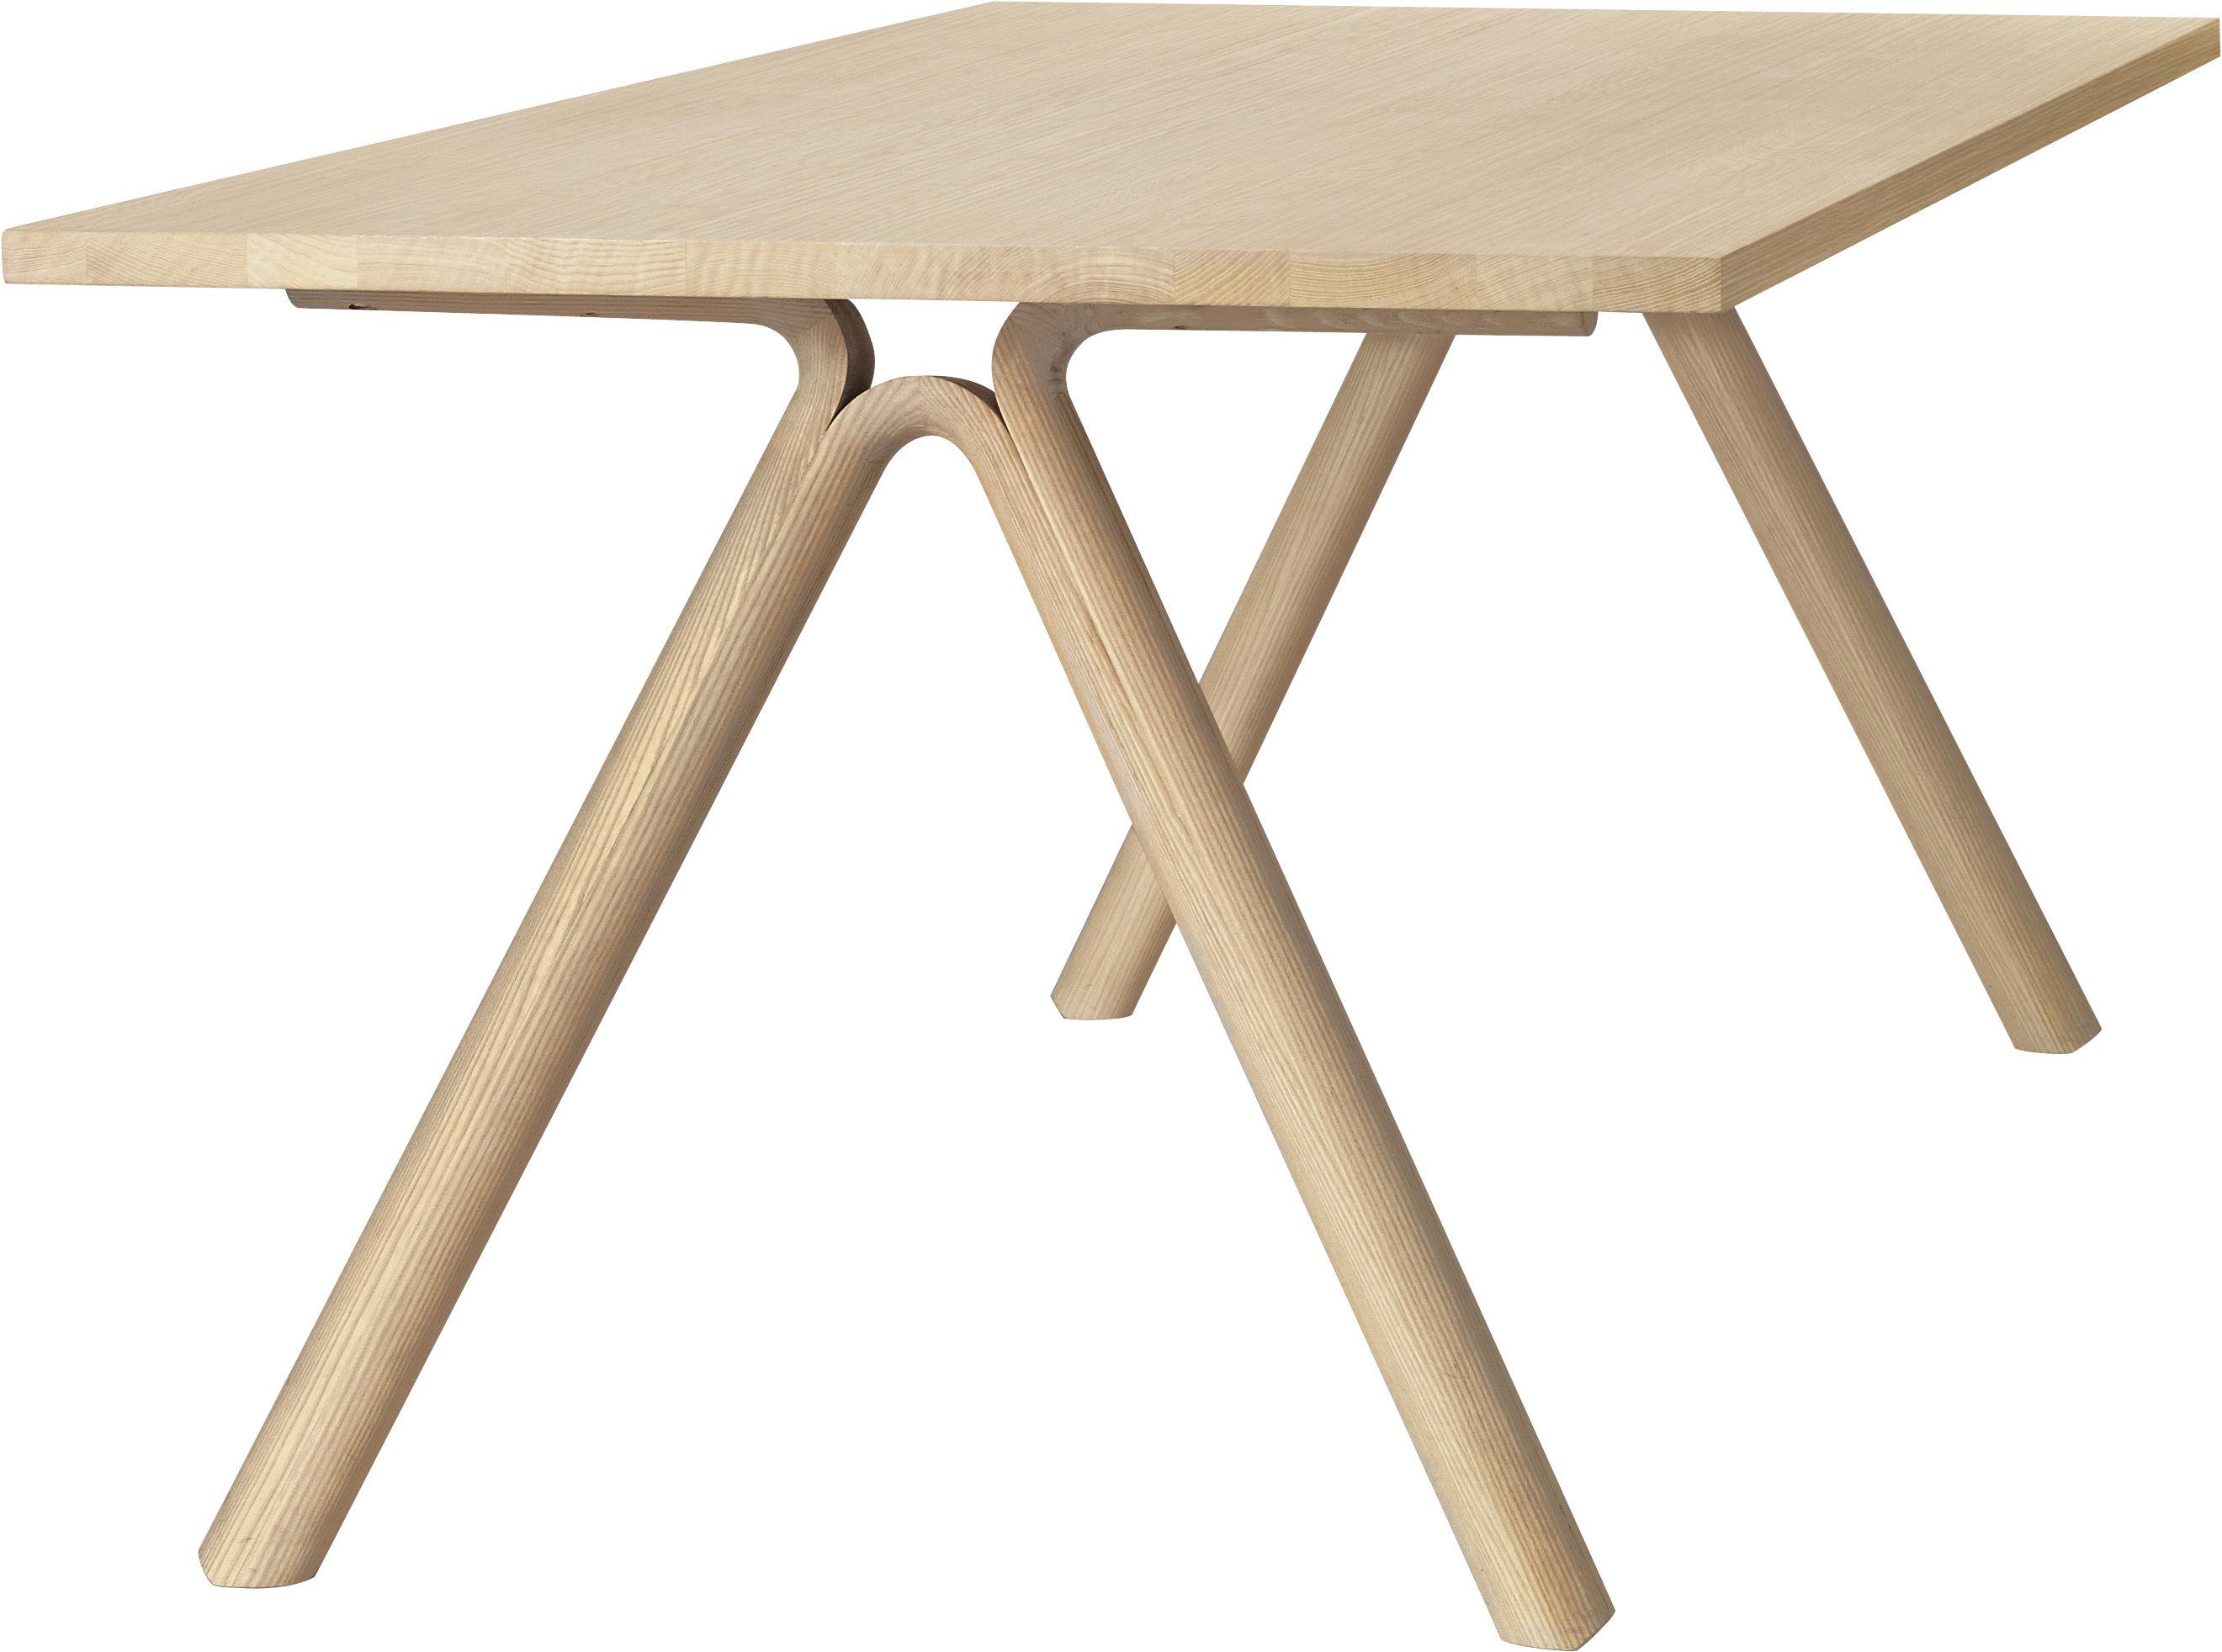 Trends - Take your seat! - Split Rectangular table - W 220 cm by Muuto - Solid oak - Solid oak